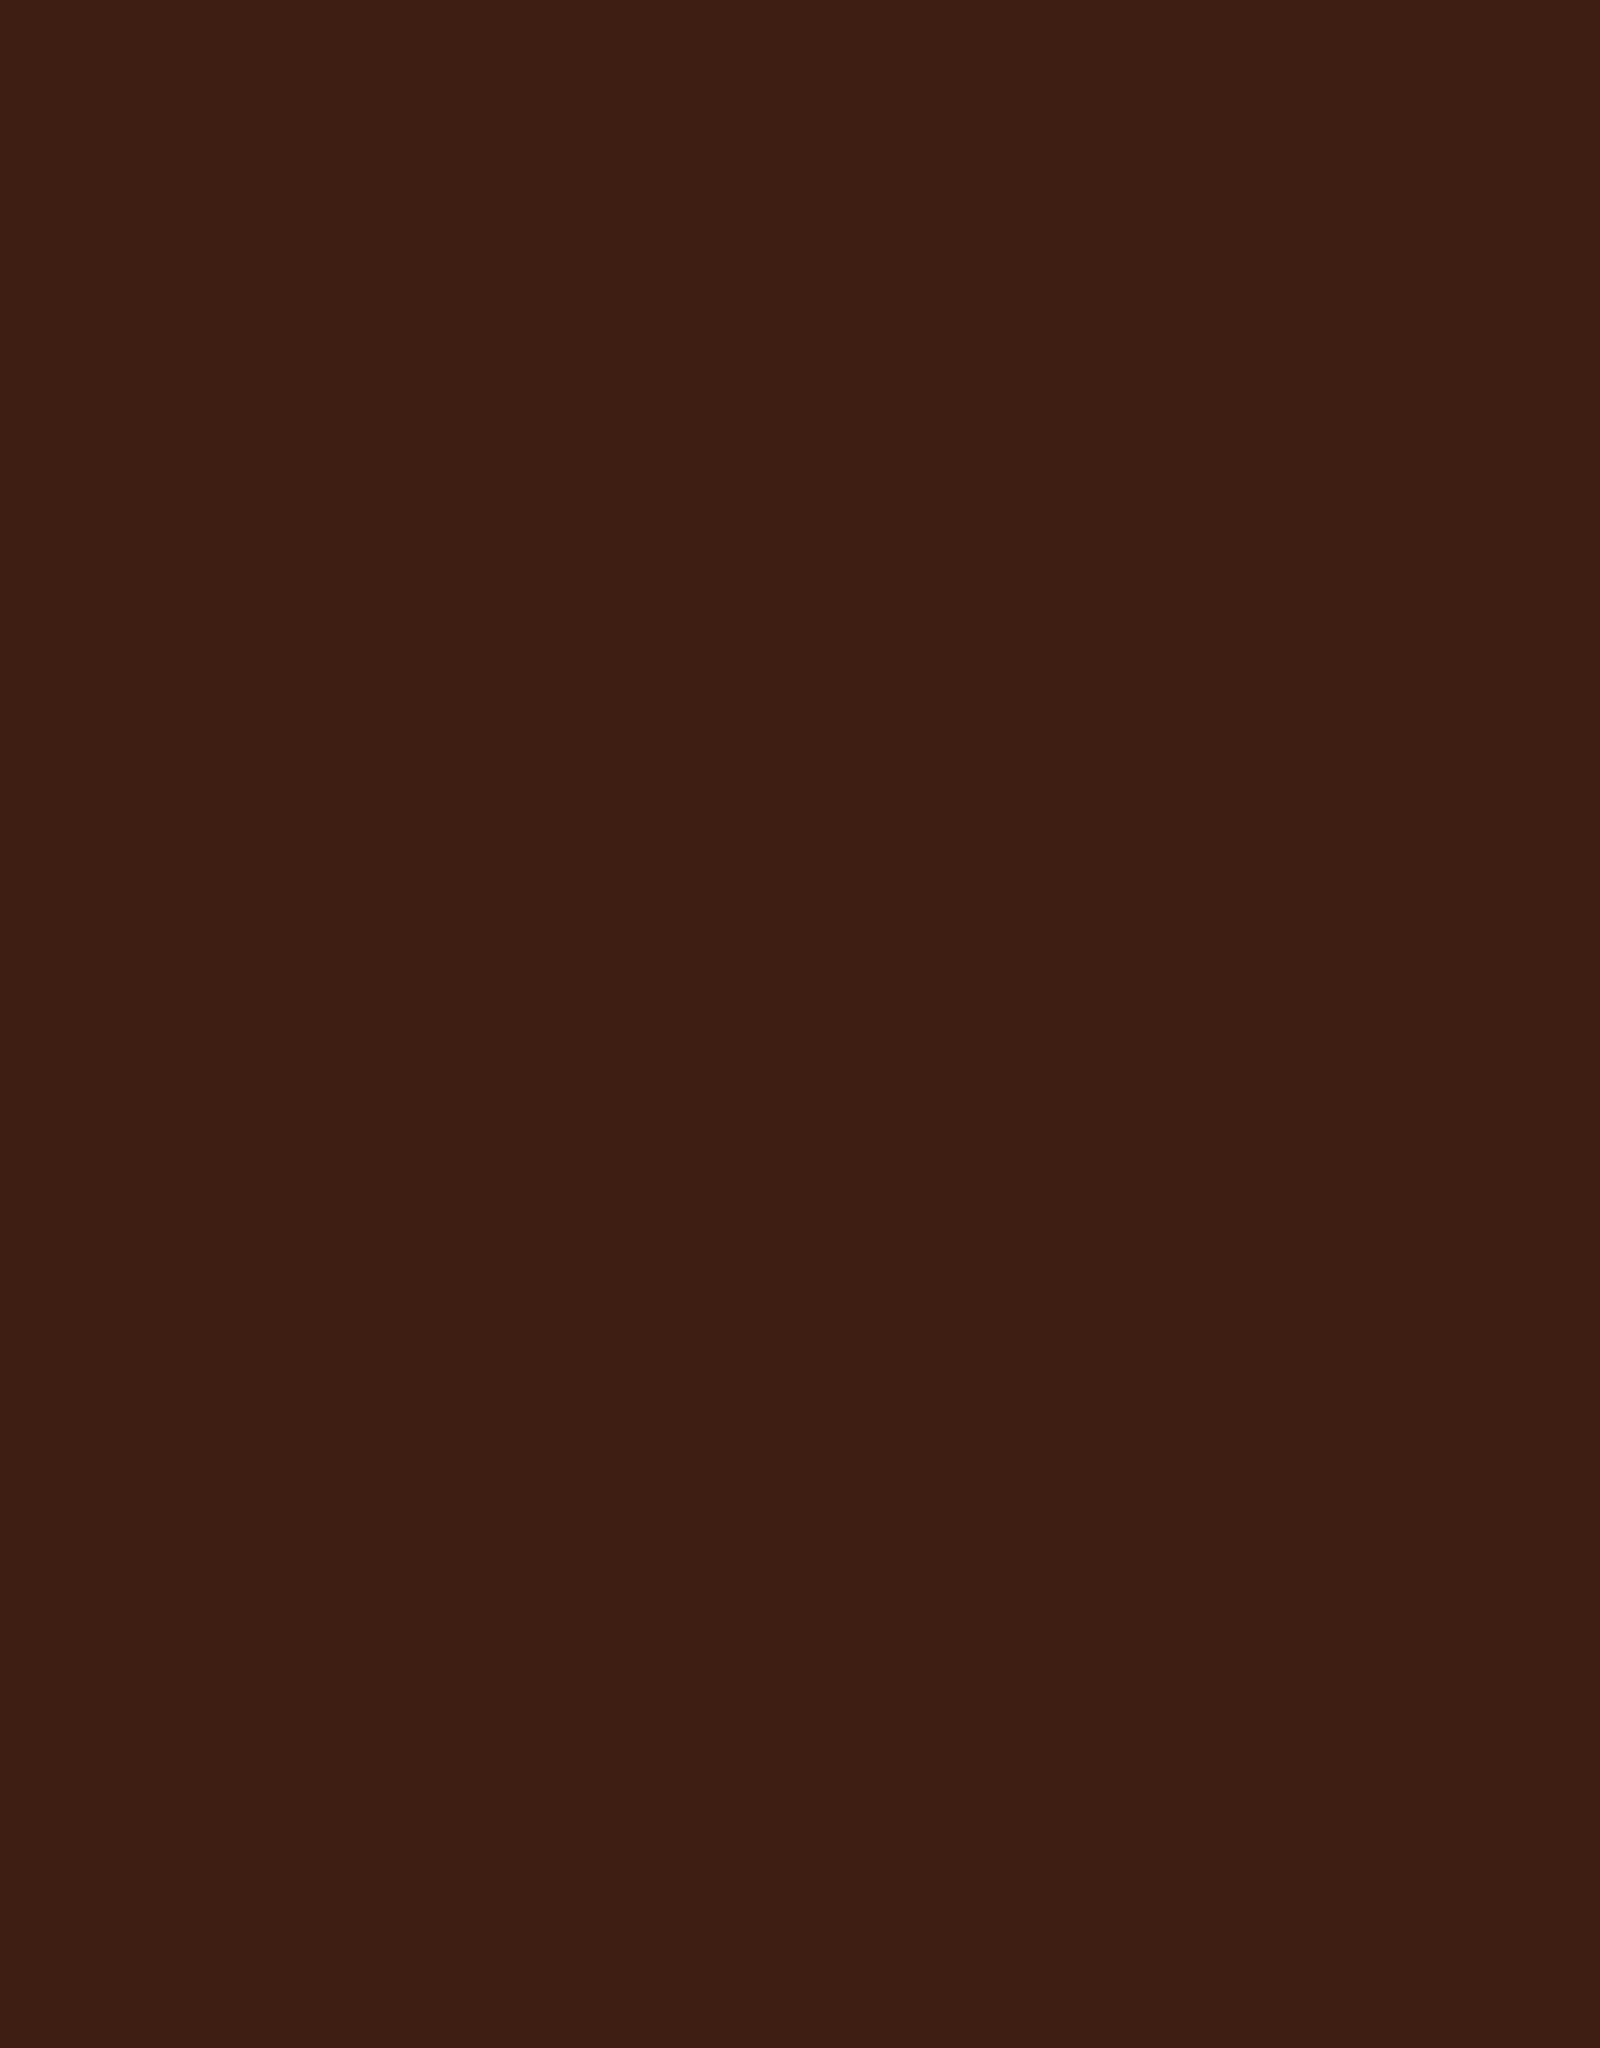 Trapsuutjies Chocolade Large